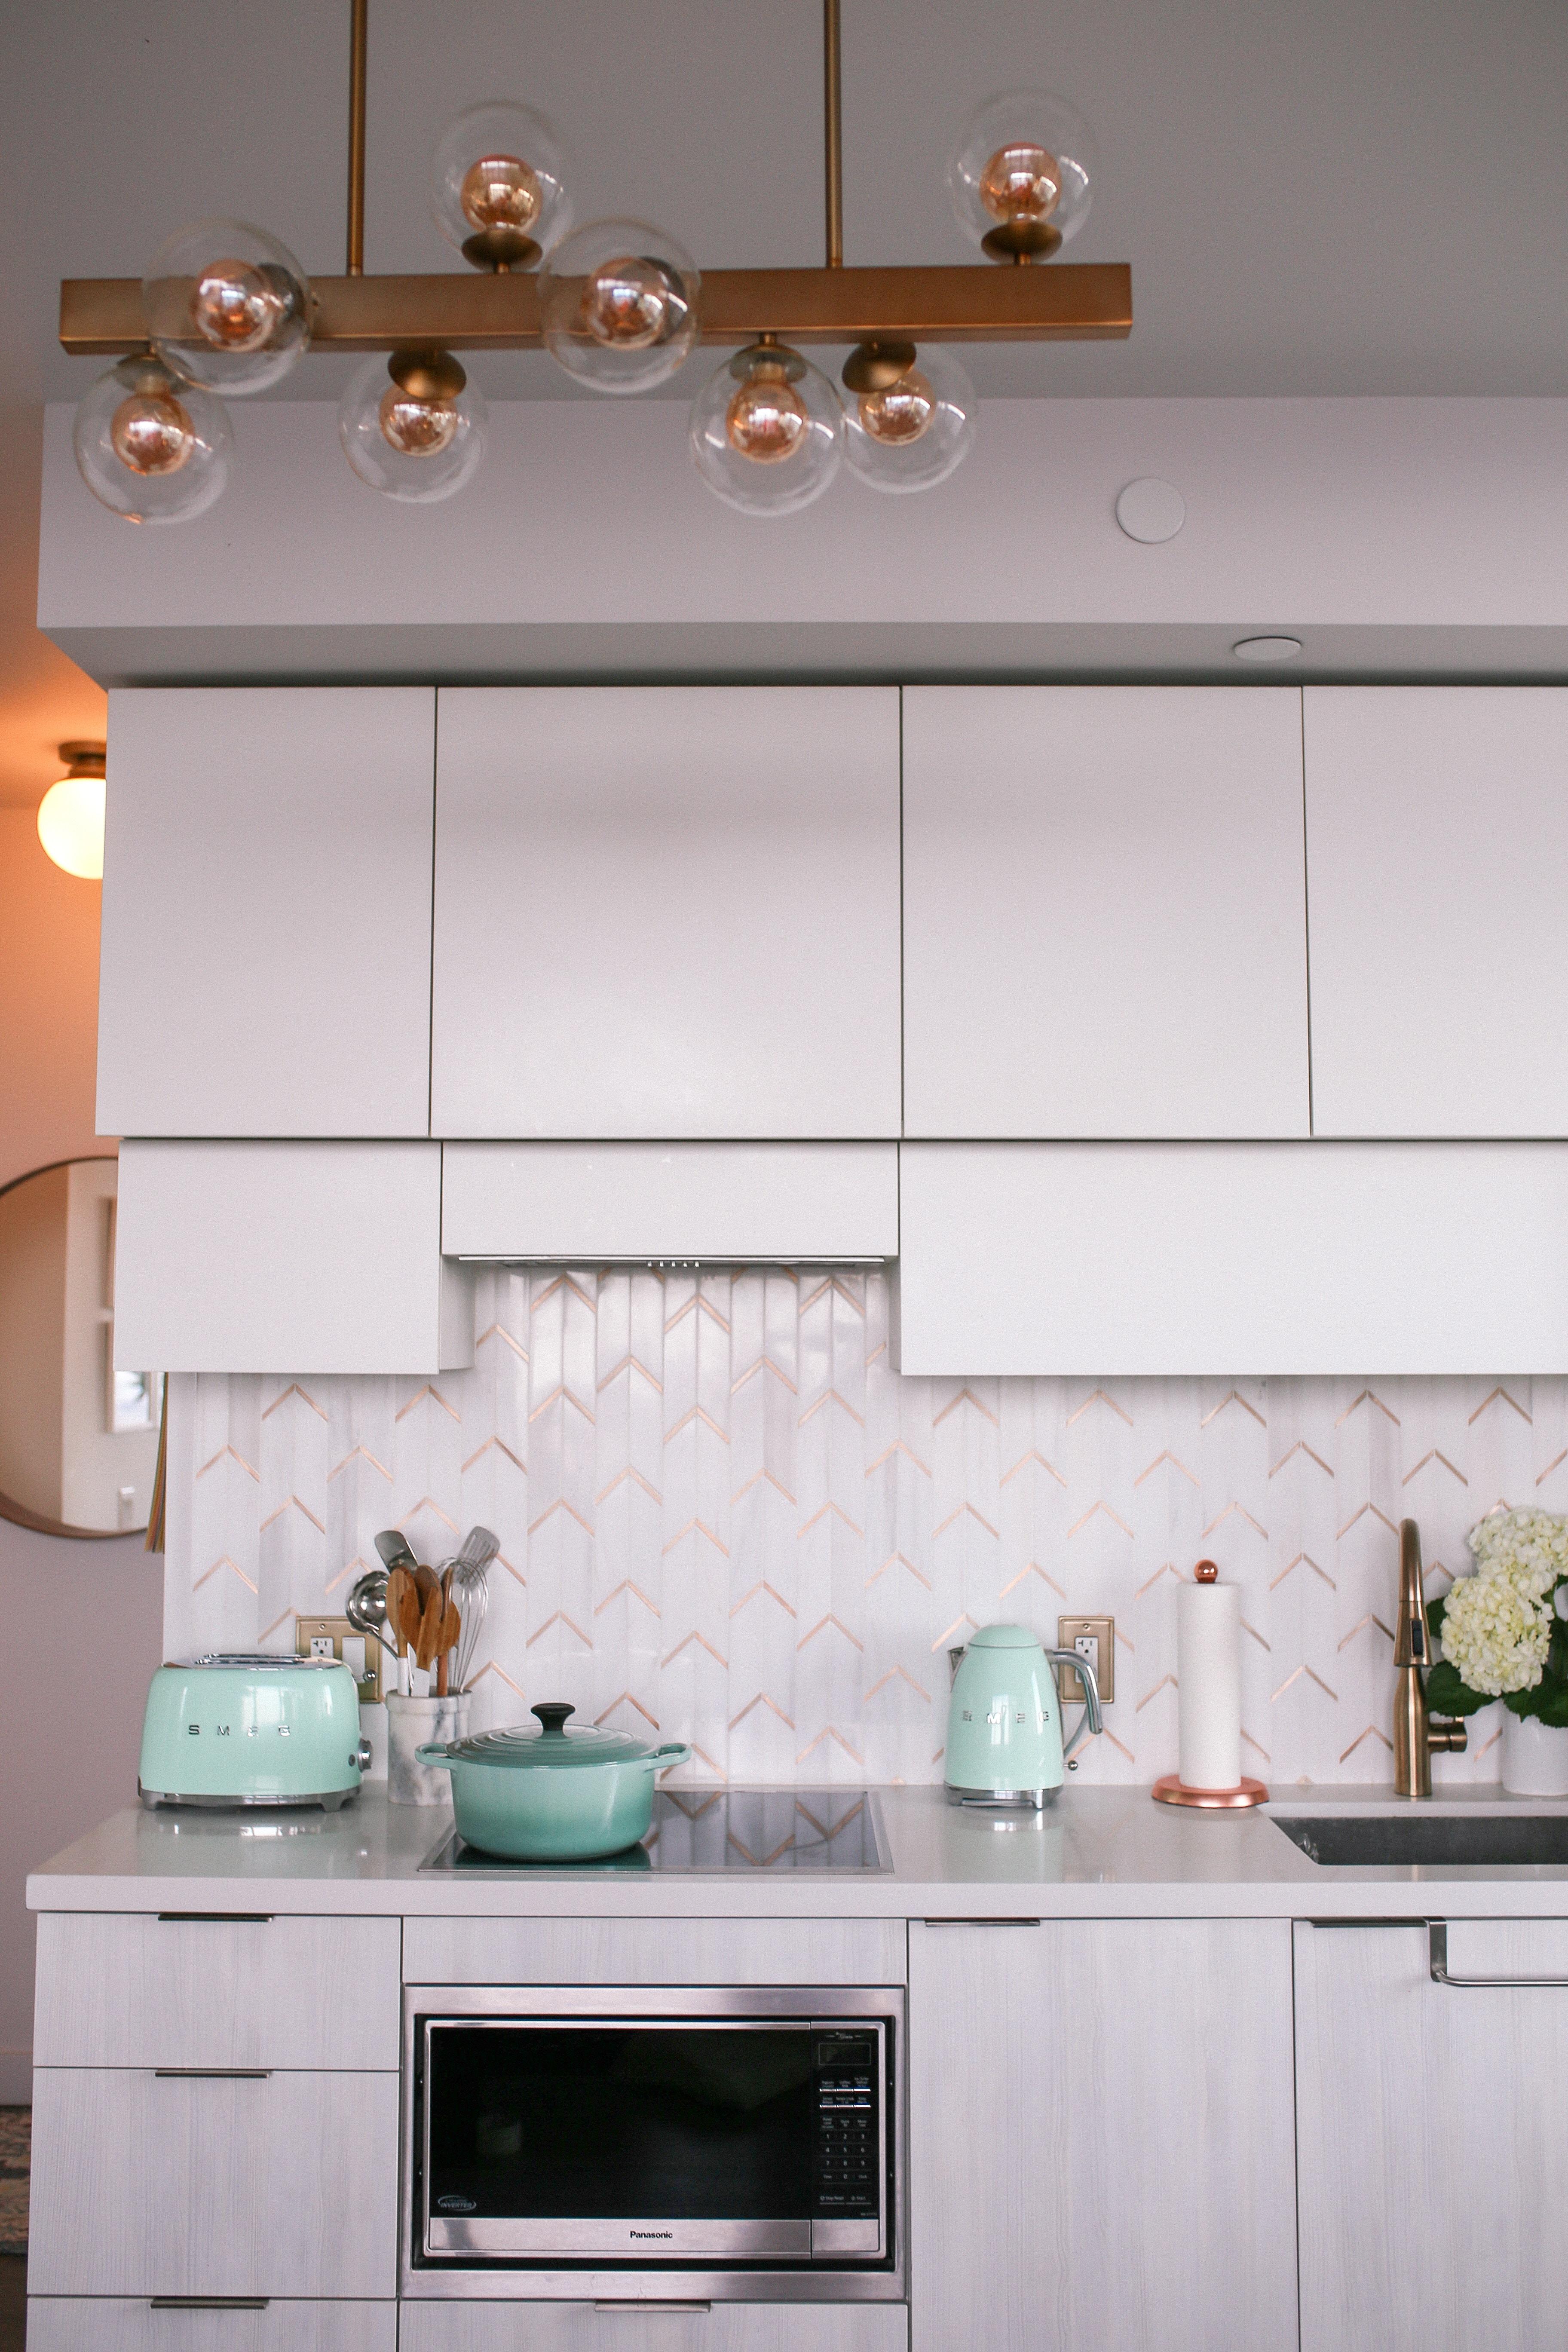 Condo-friendly ktichen makeover featuring a marble chevron backsplash with metal details, Smeg pastel green appliances, Le Creuset and a Delta Champagne Bronze faucet.